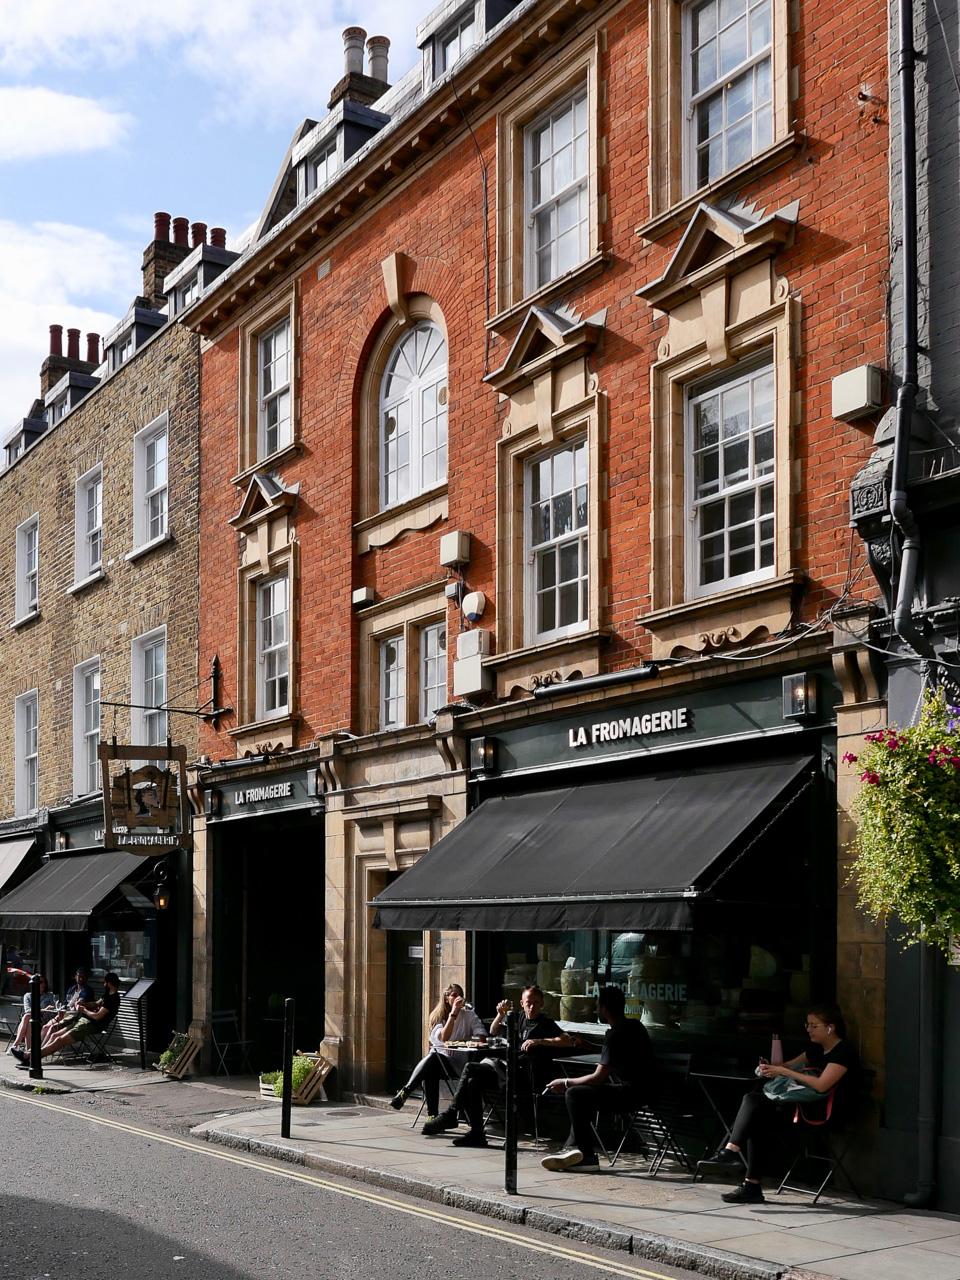 Cara Sharratt Travel - Marylebone - London, England